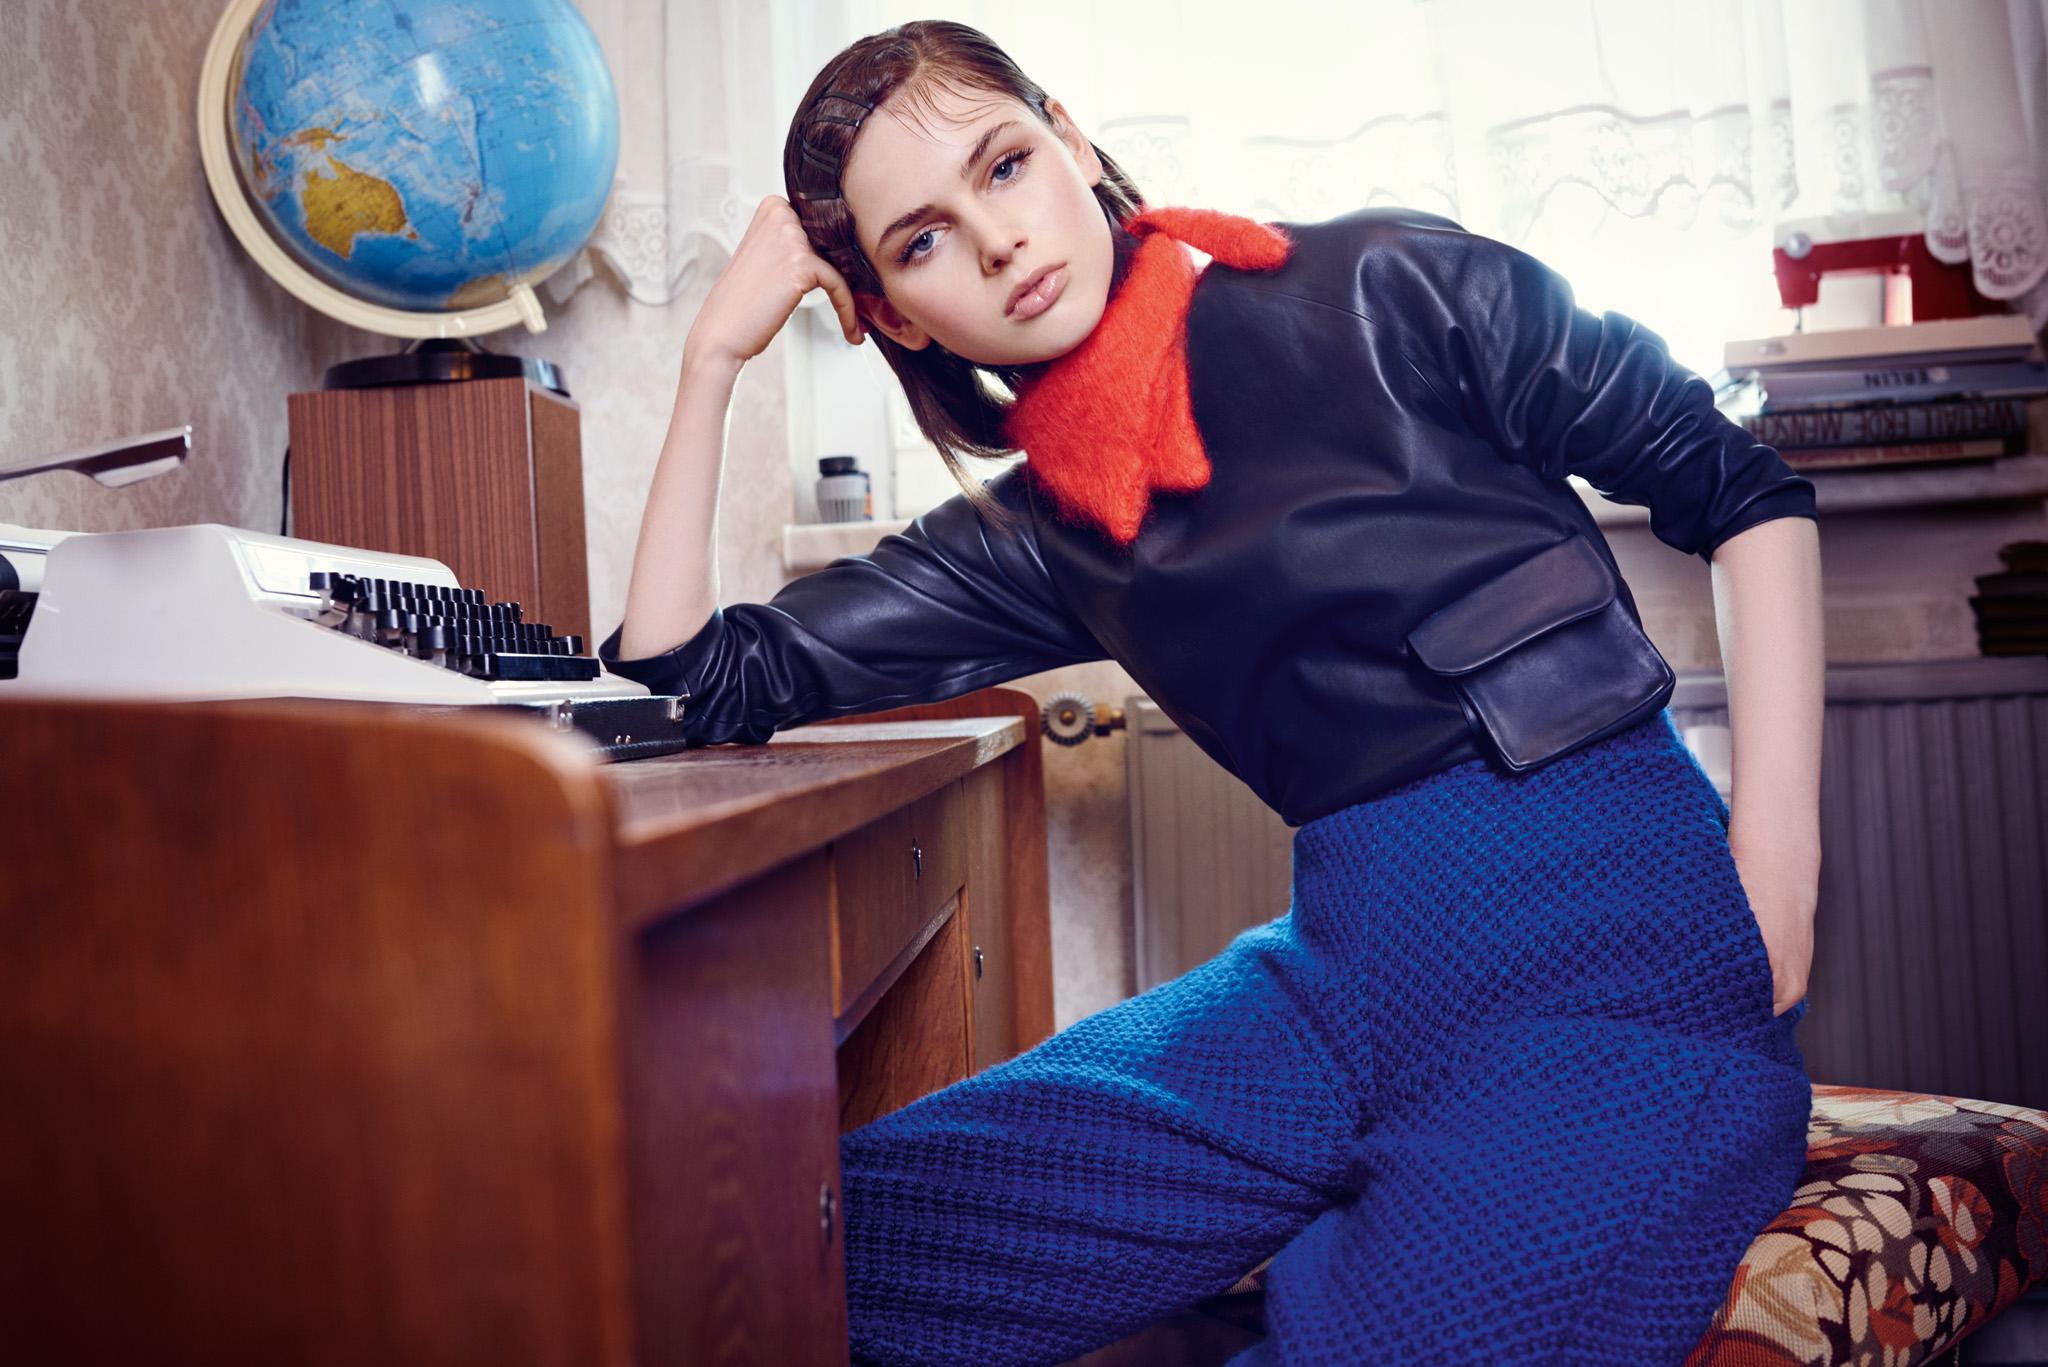 Marina Hoermanseder |Photographer Stefan Armbruster |Agency Schwester Schwarz